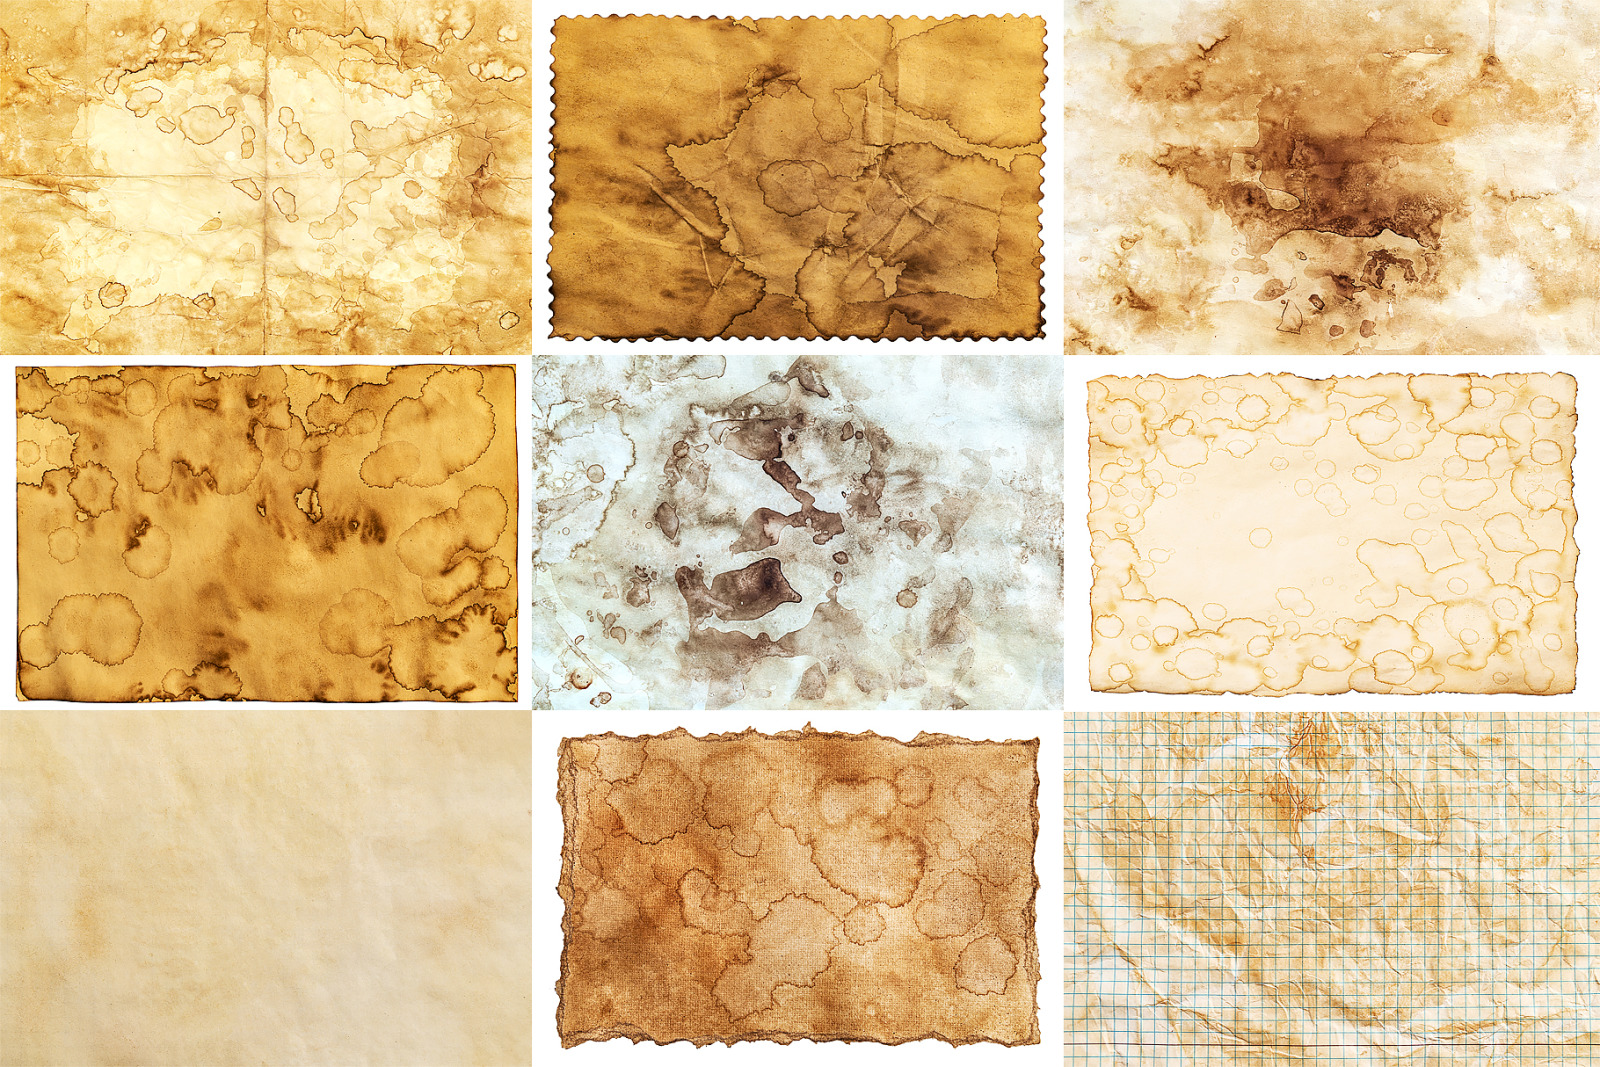 Old paper textures, vintage paper backgrounds, antique paper collection